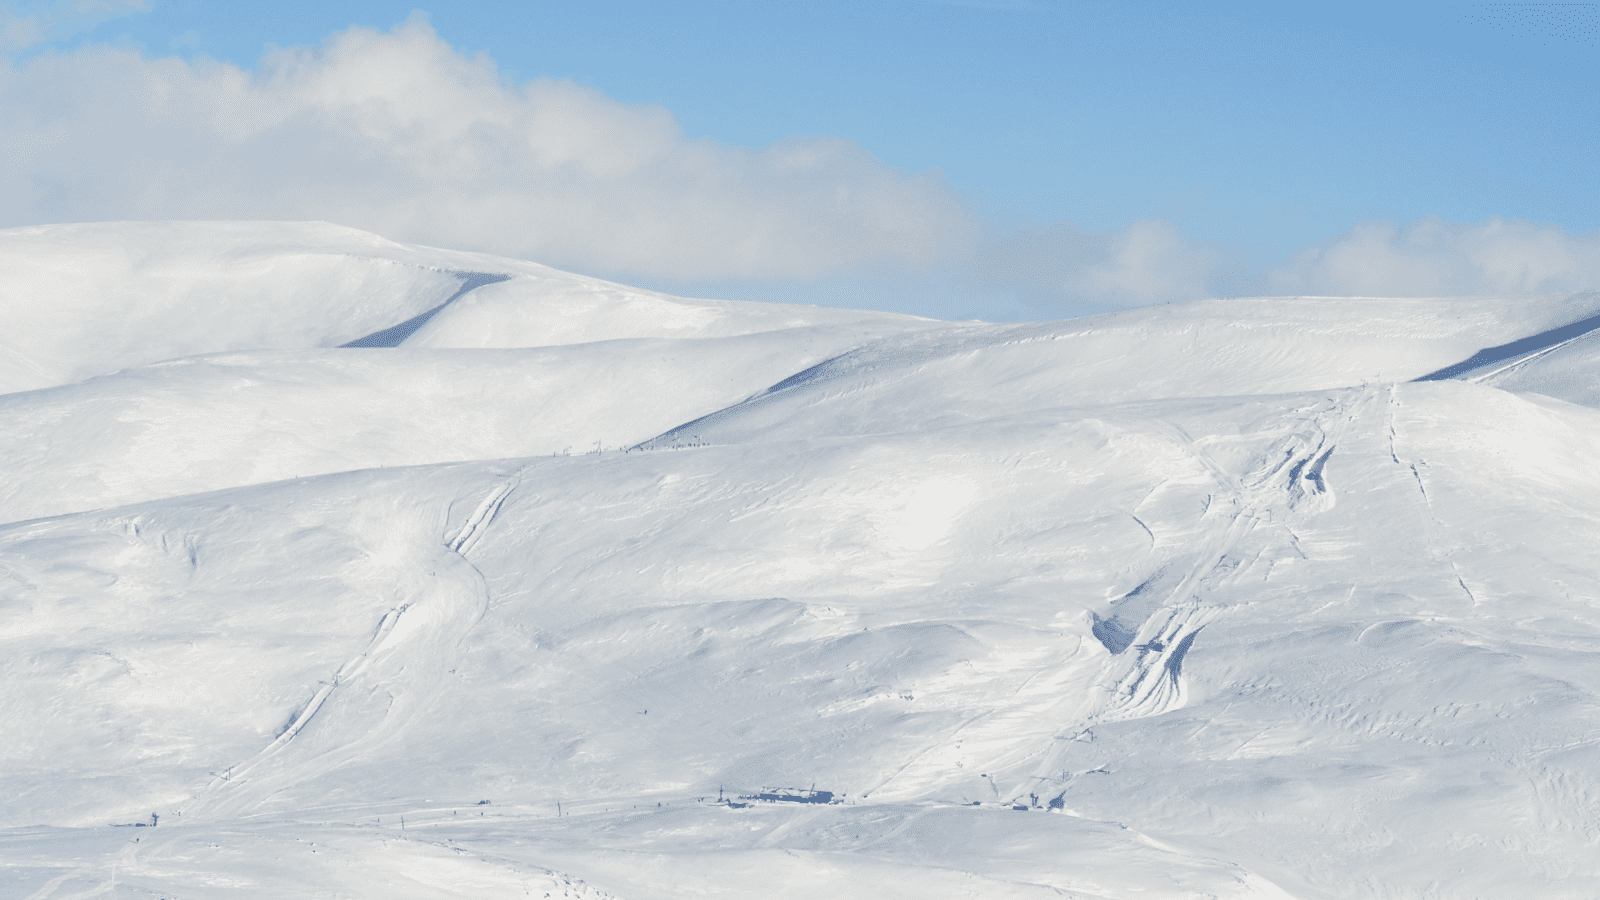 Glenshee Scotland Skiing Ski Transfers Ski-Lifts Ltd